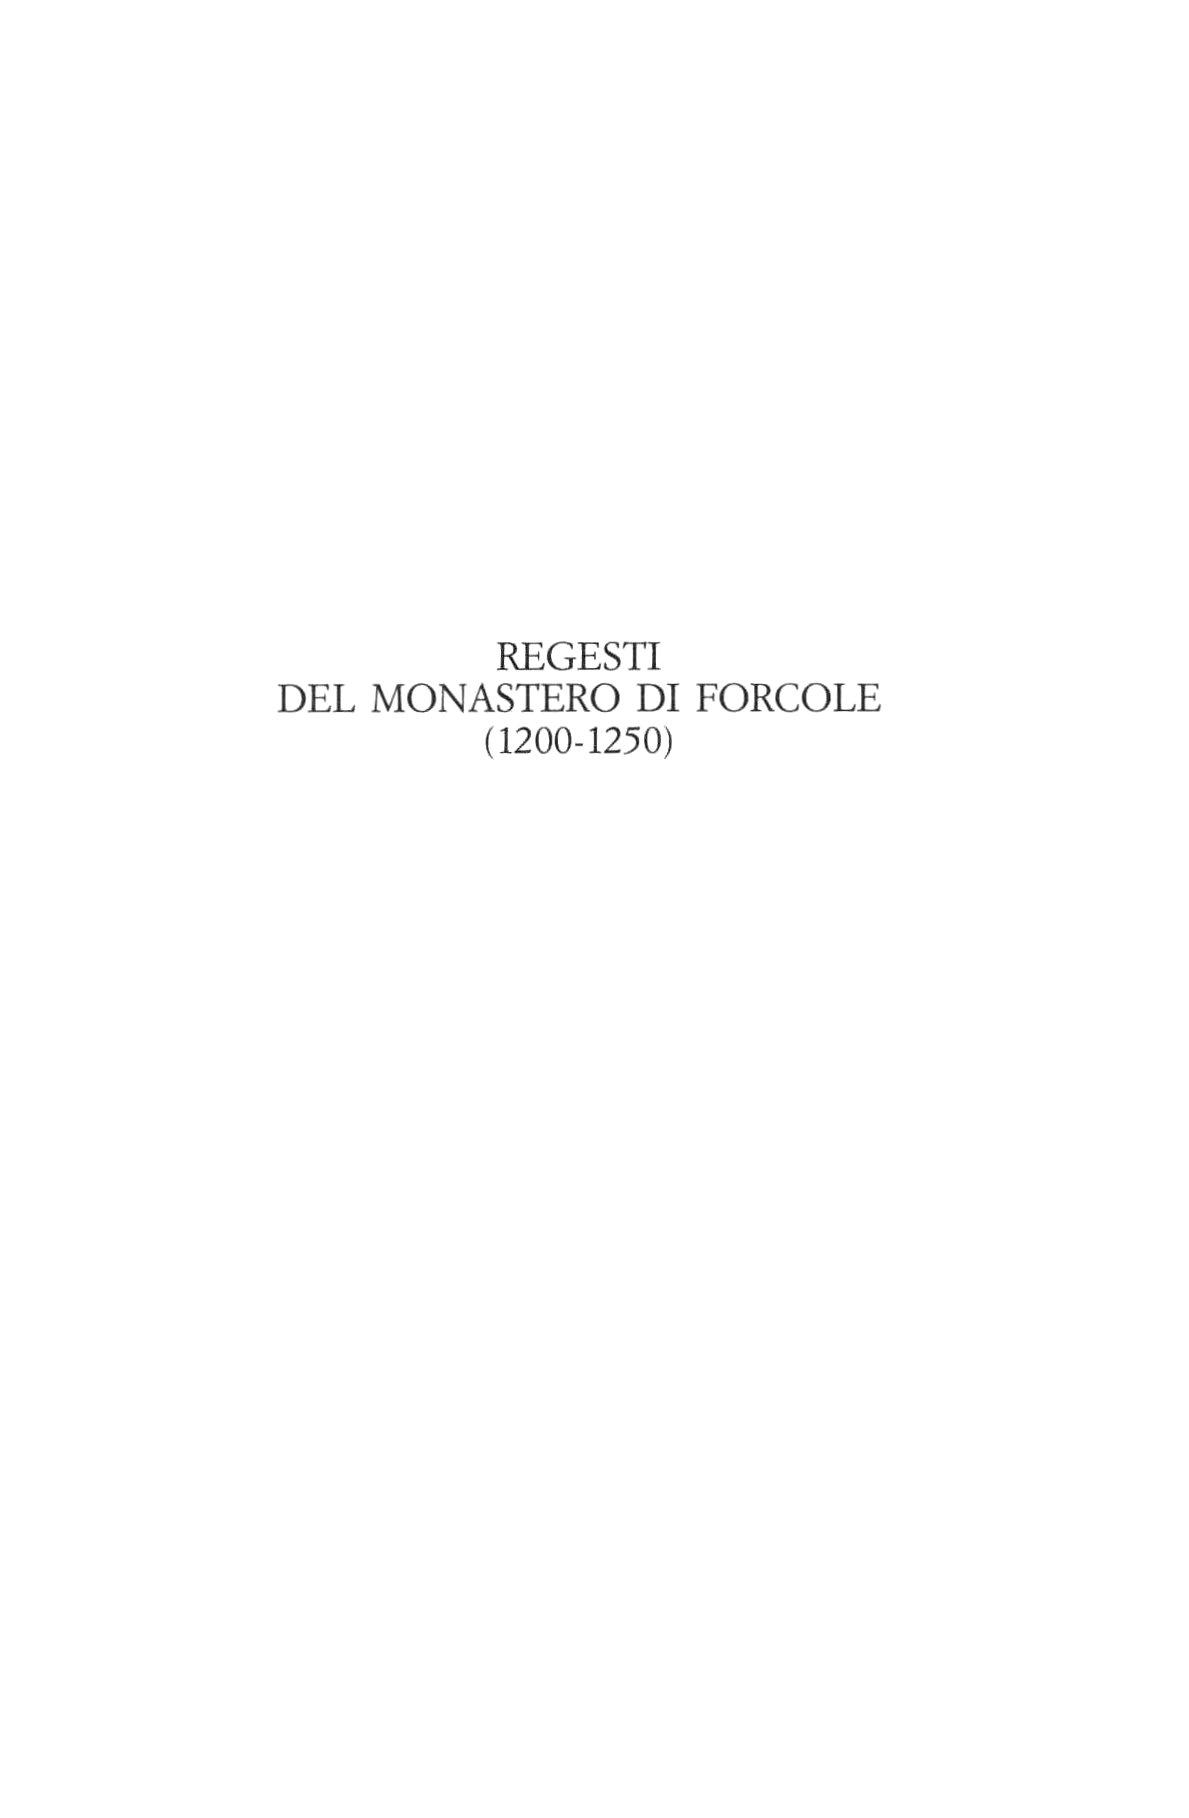 !Monastero Forcole 00018.jpg